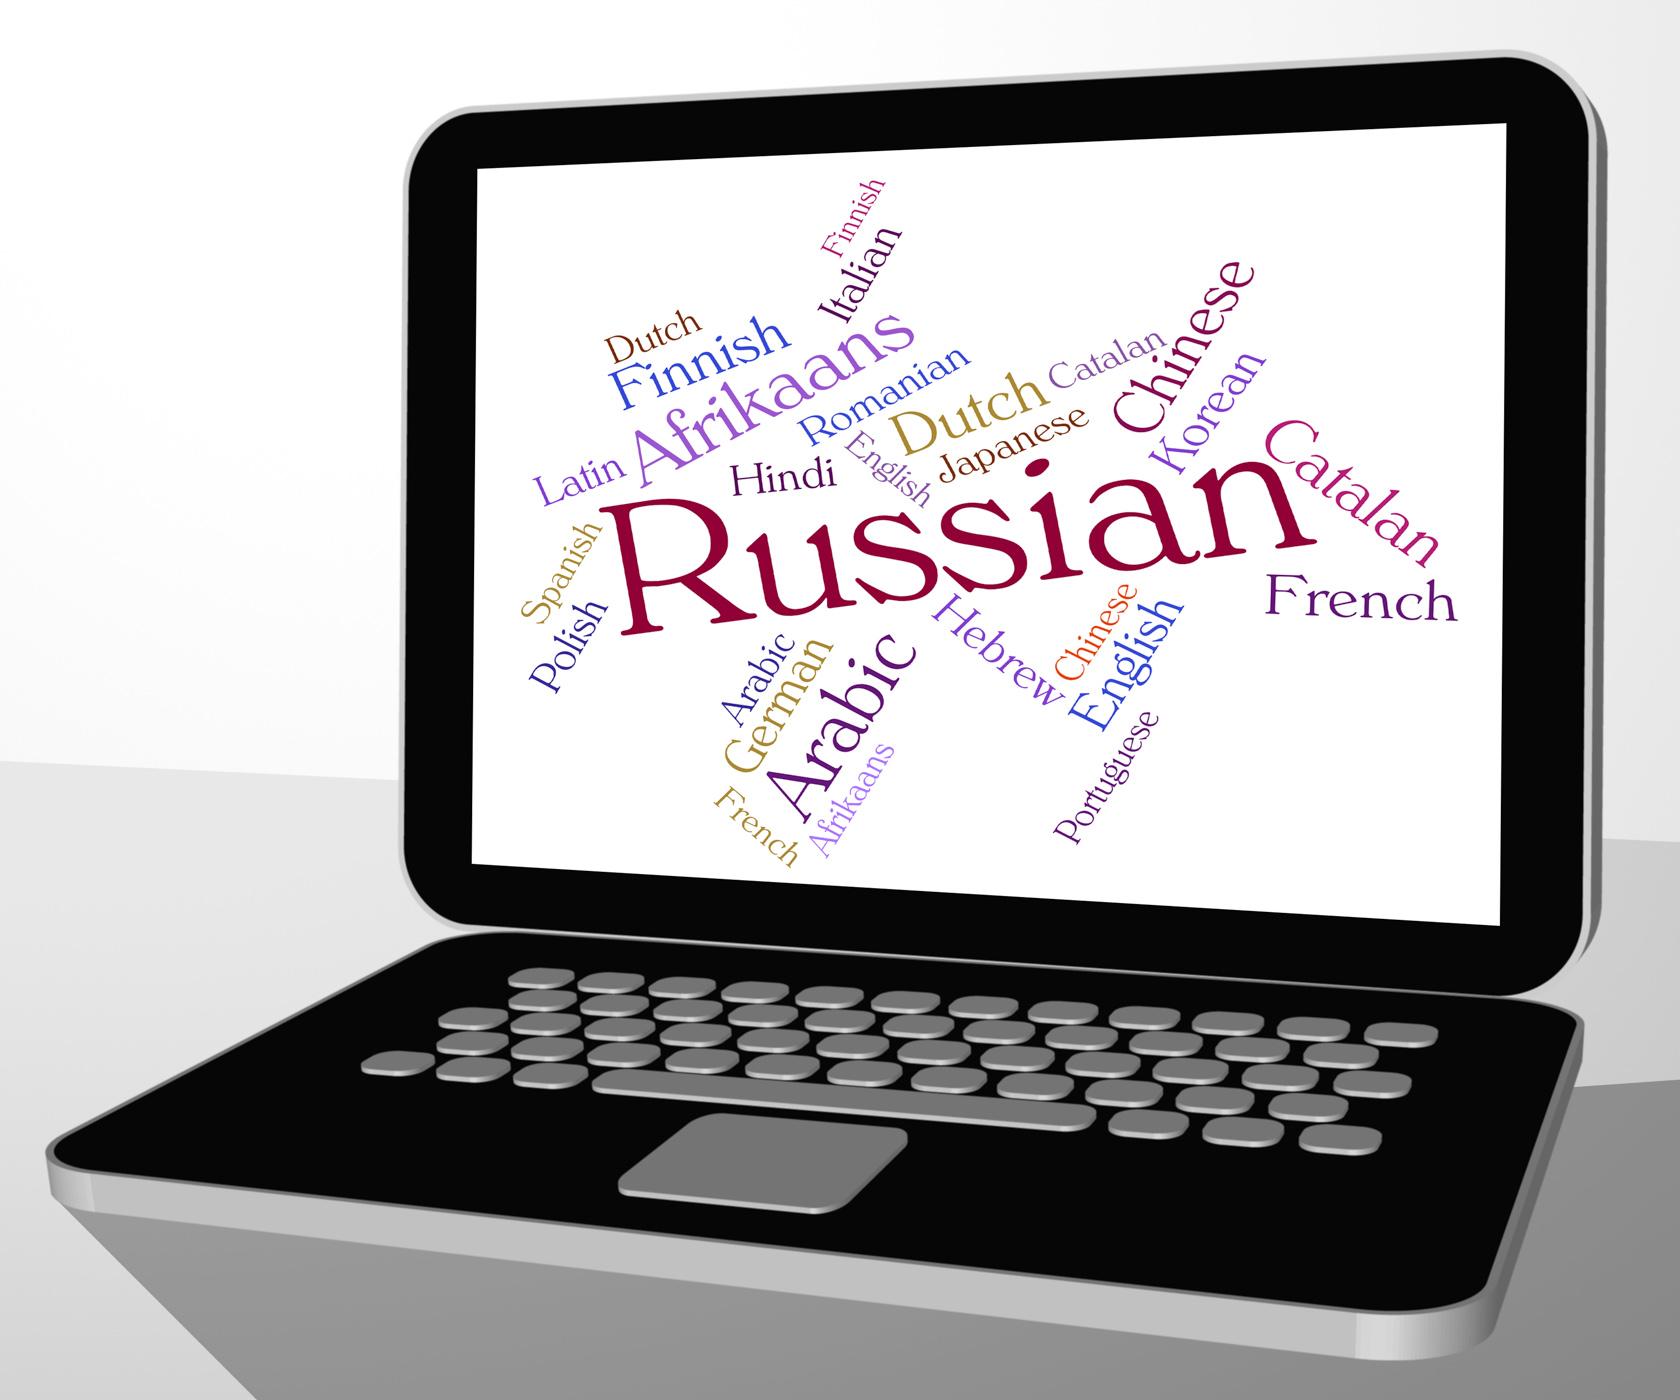 Russian language represents translator lingo and foreign photo